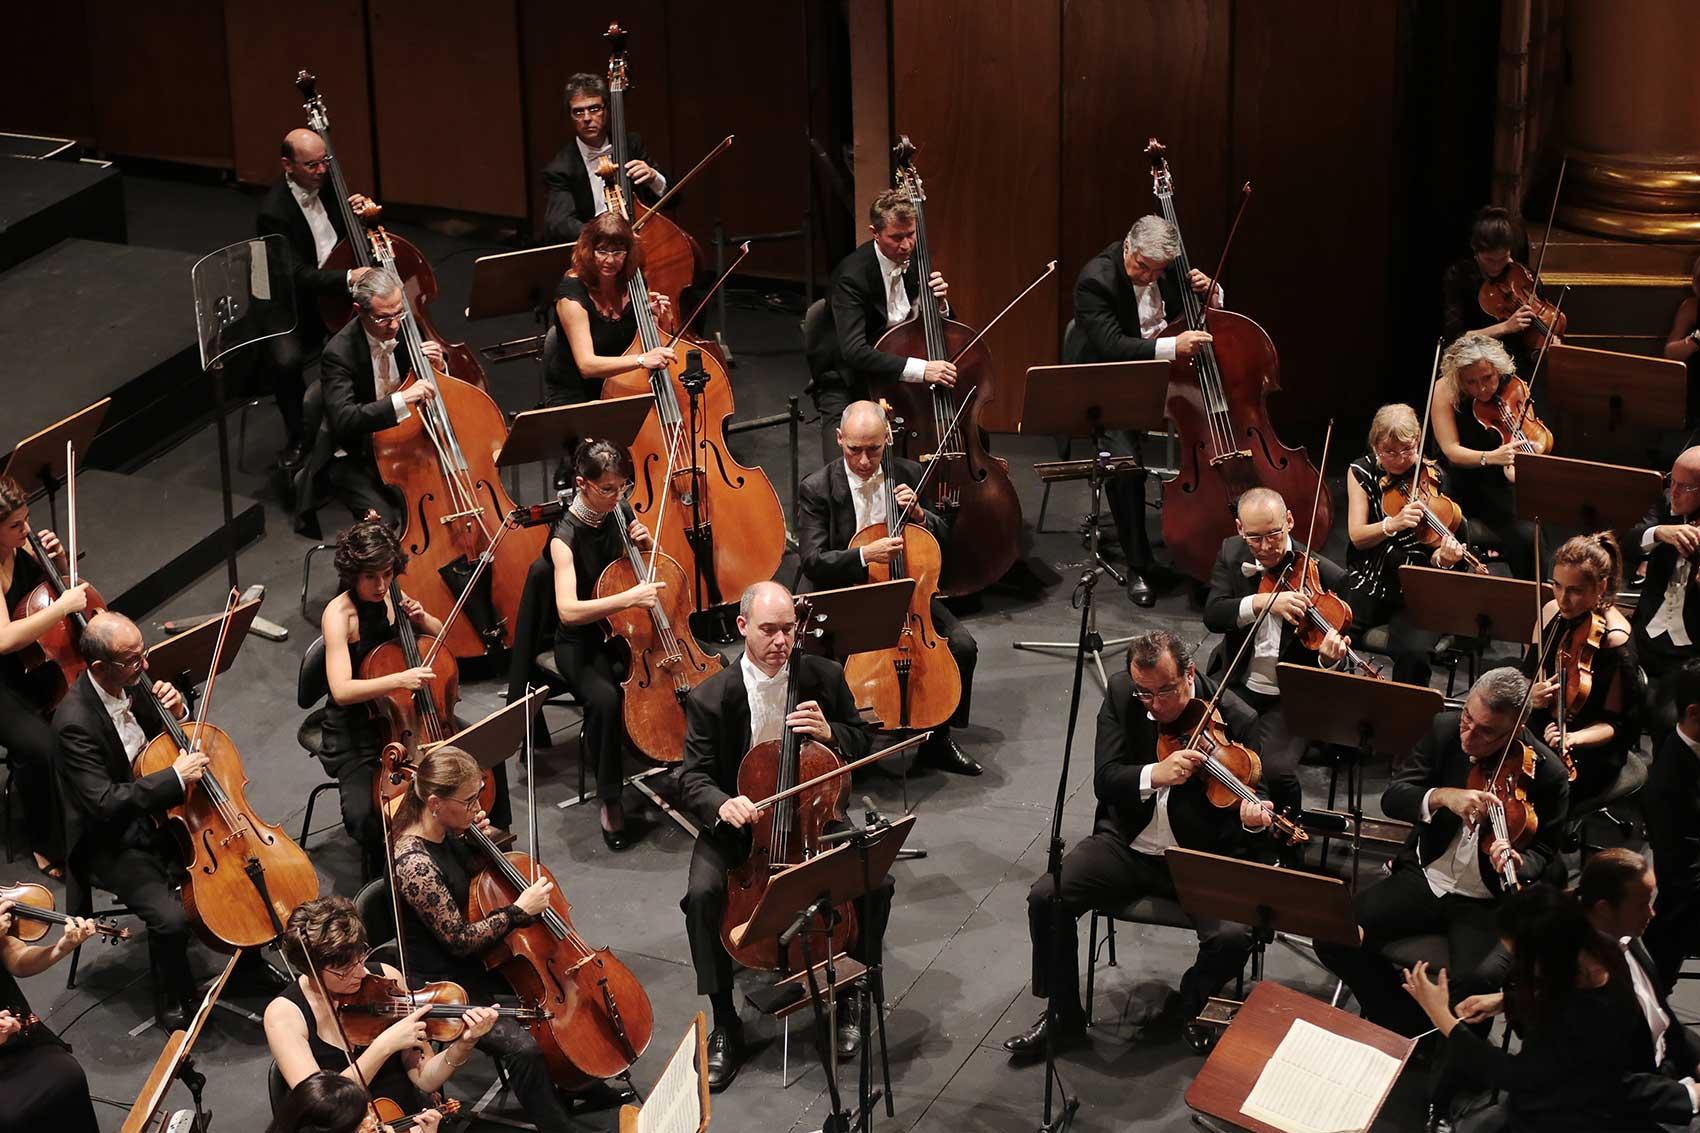 https://www.festivalaolargo.pt/assets/images/millennium-festival-ao-largo-2020-cordas-da-orquestra-sinfonica-portuguesa.jpg